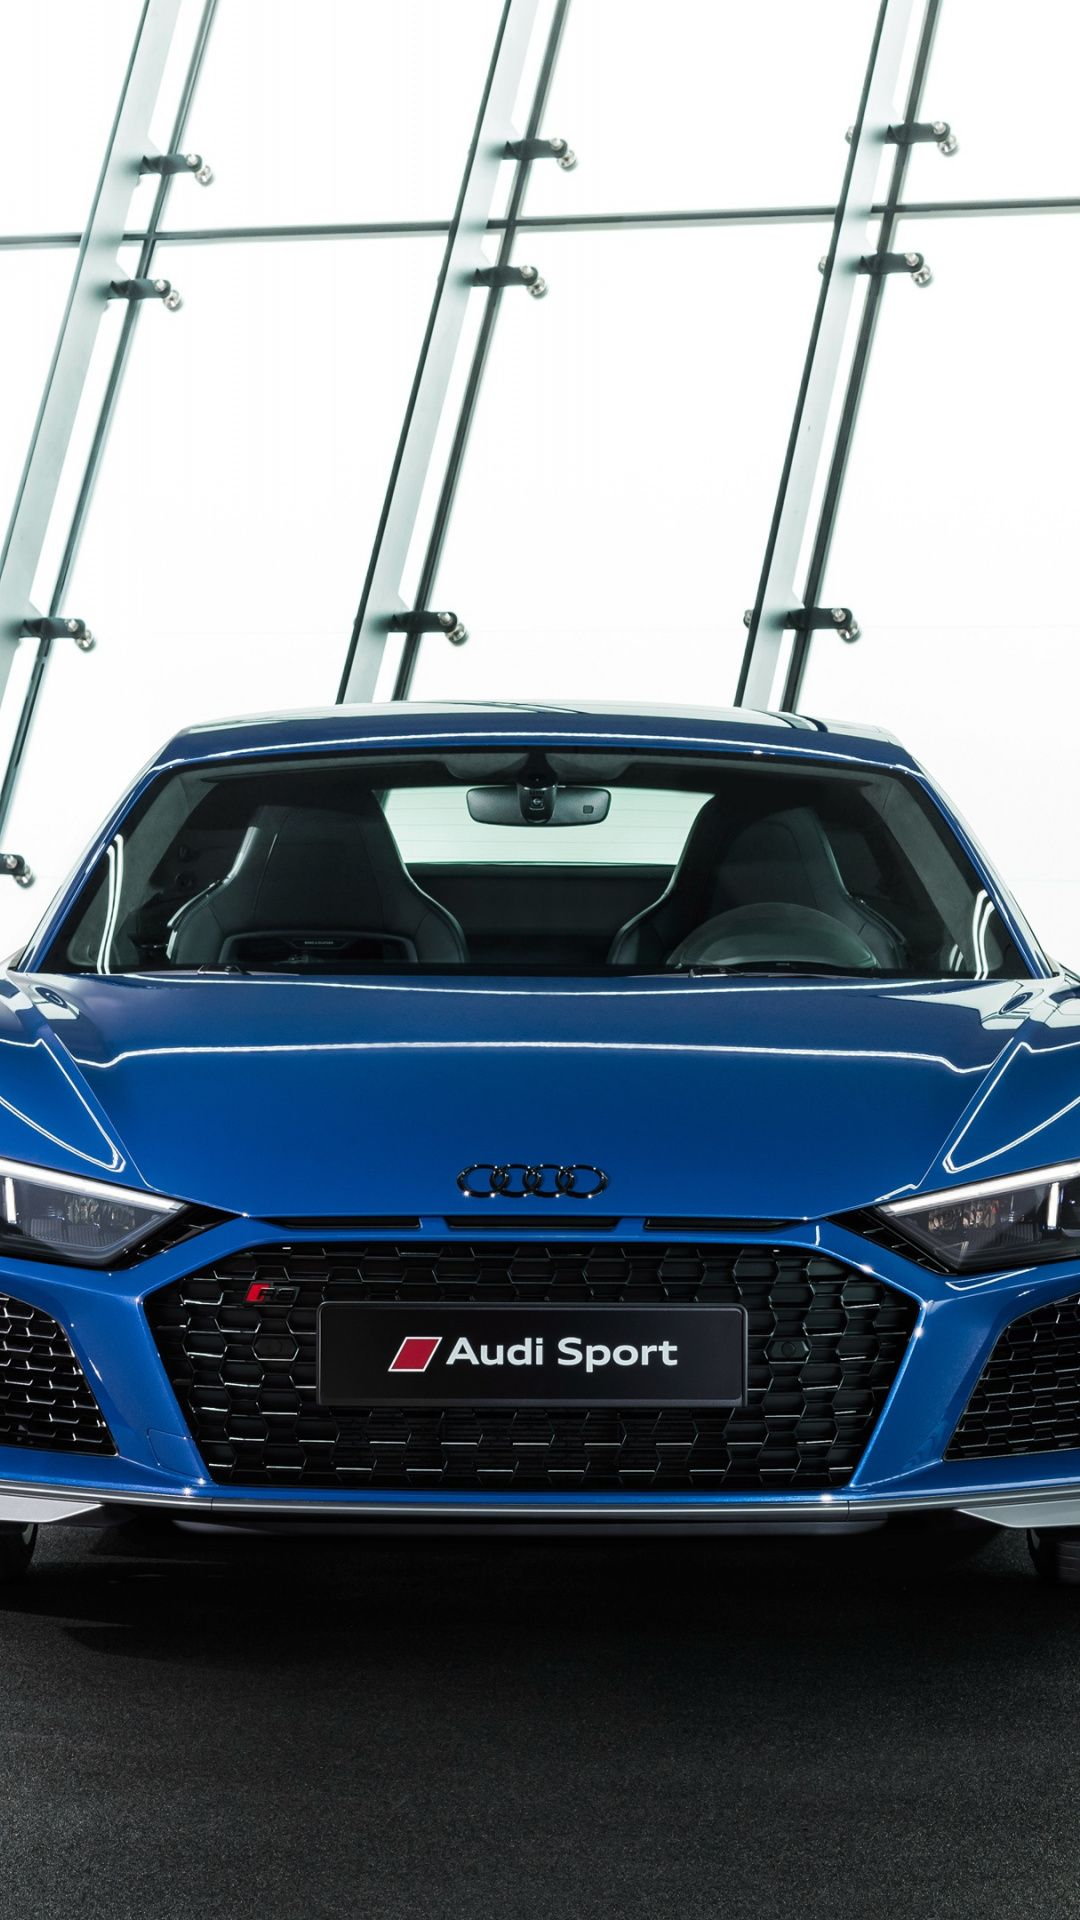 Audi Sport Audi R8 V10 Wallpaper Audi Audi R8 Audi Sport